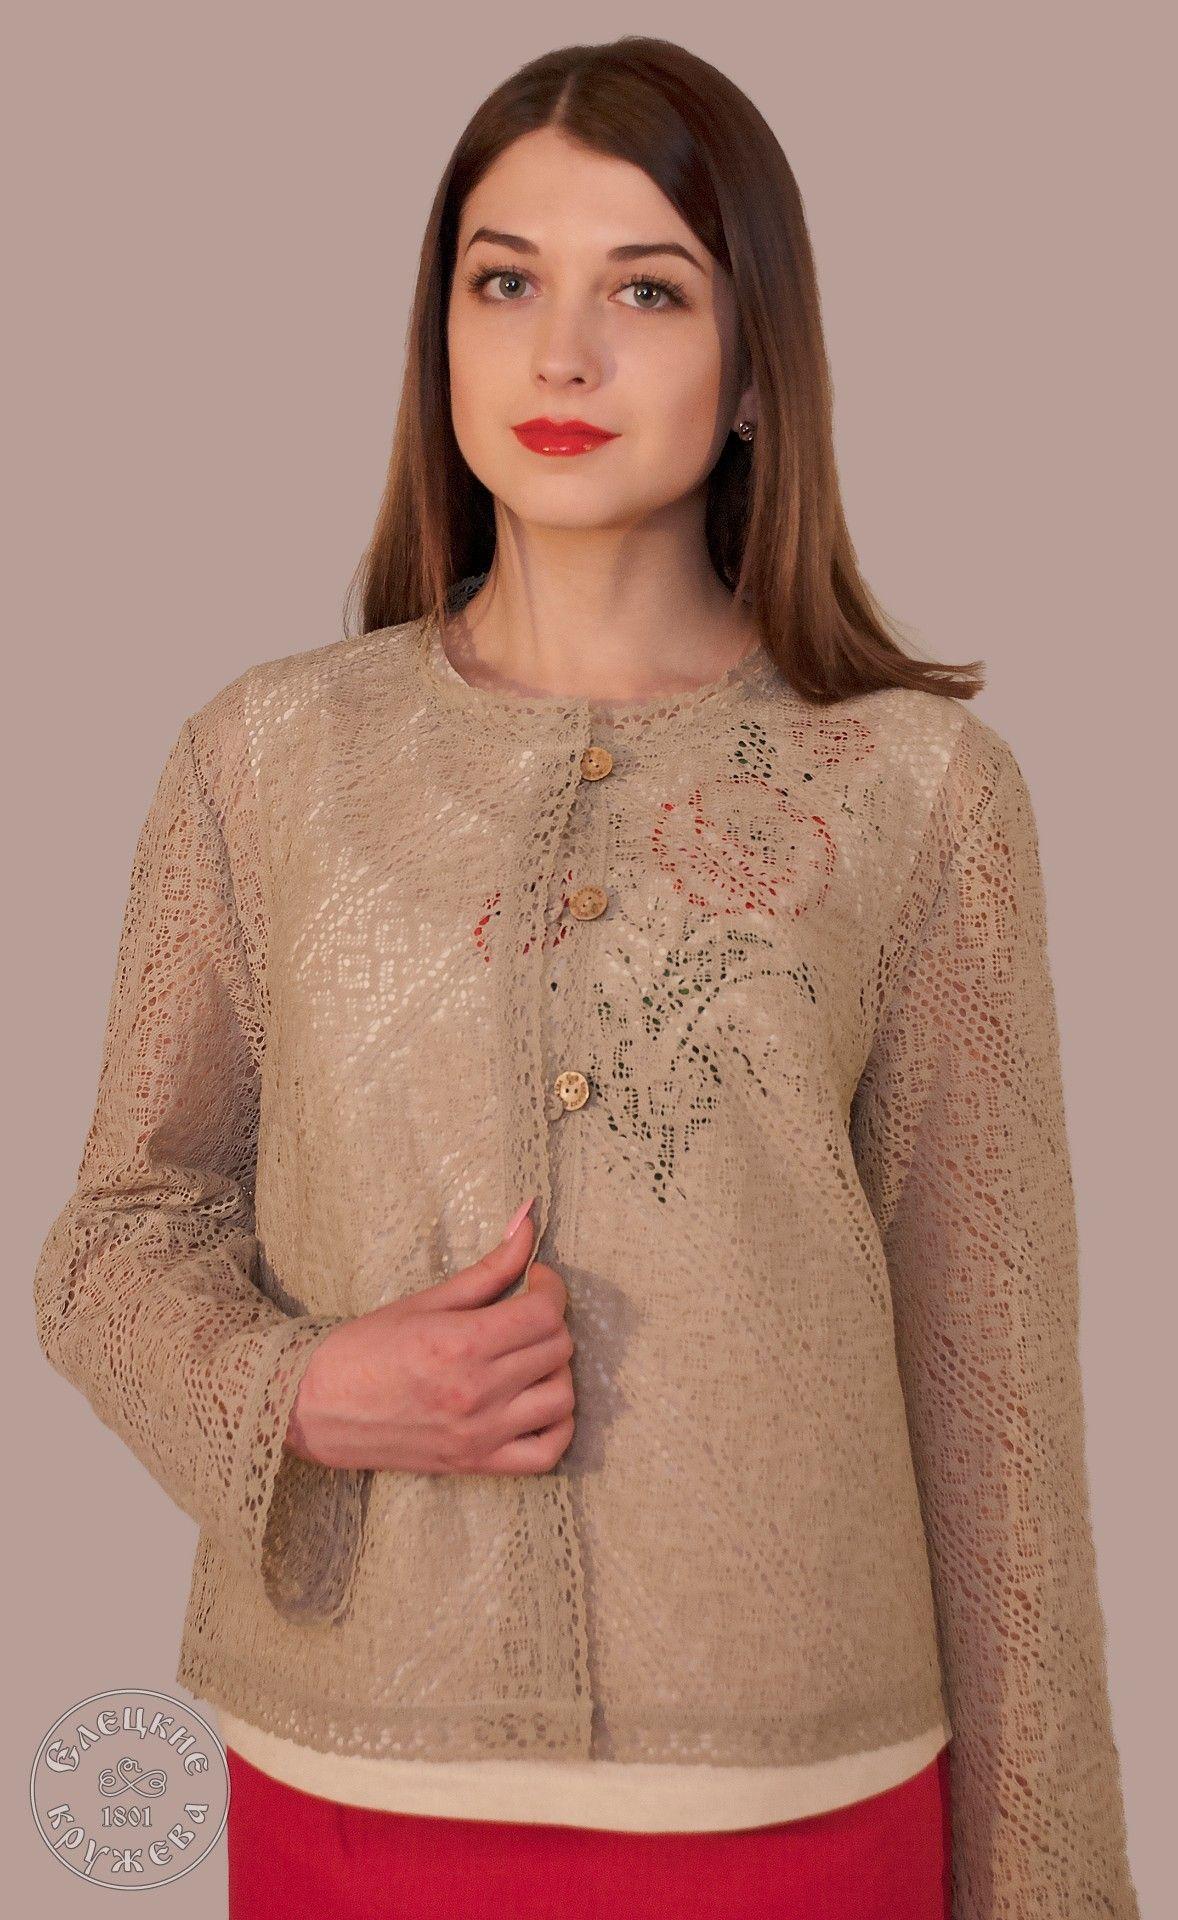 Yelets lace / Women's lace jacket С2220